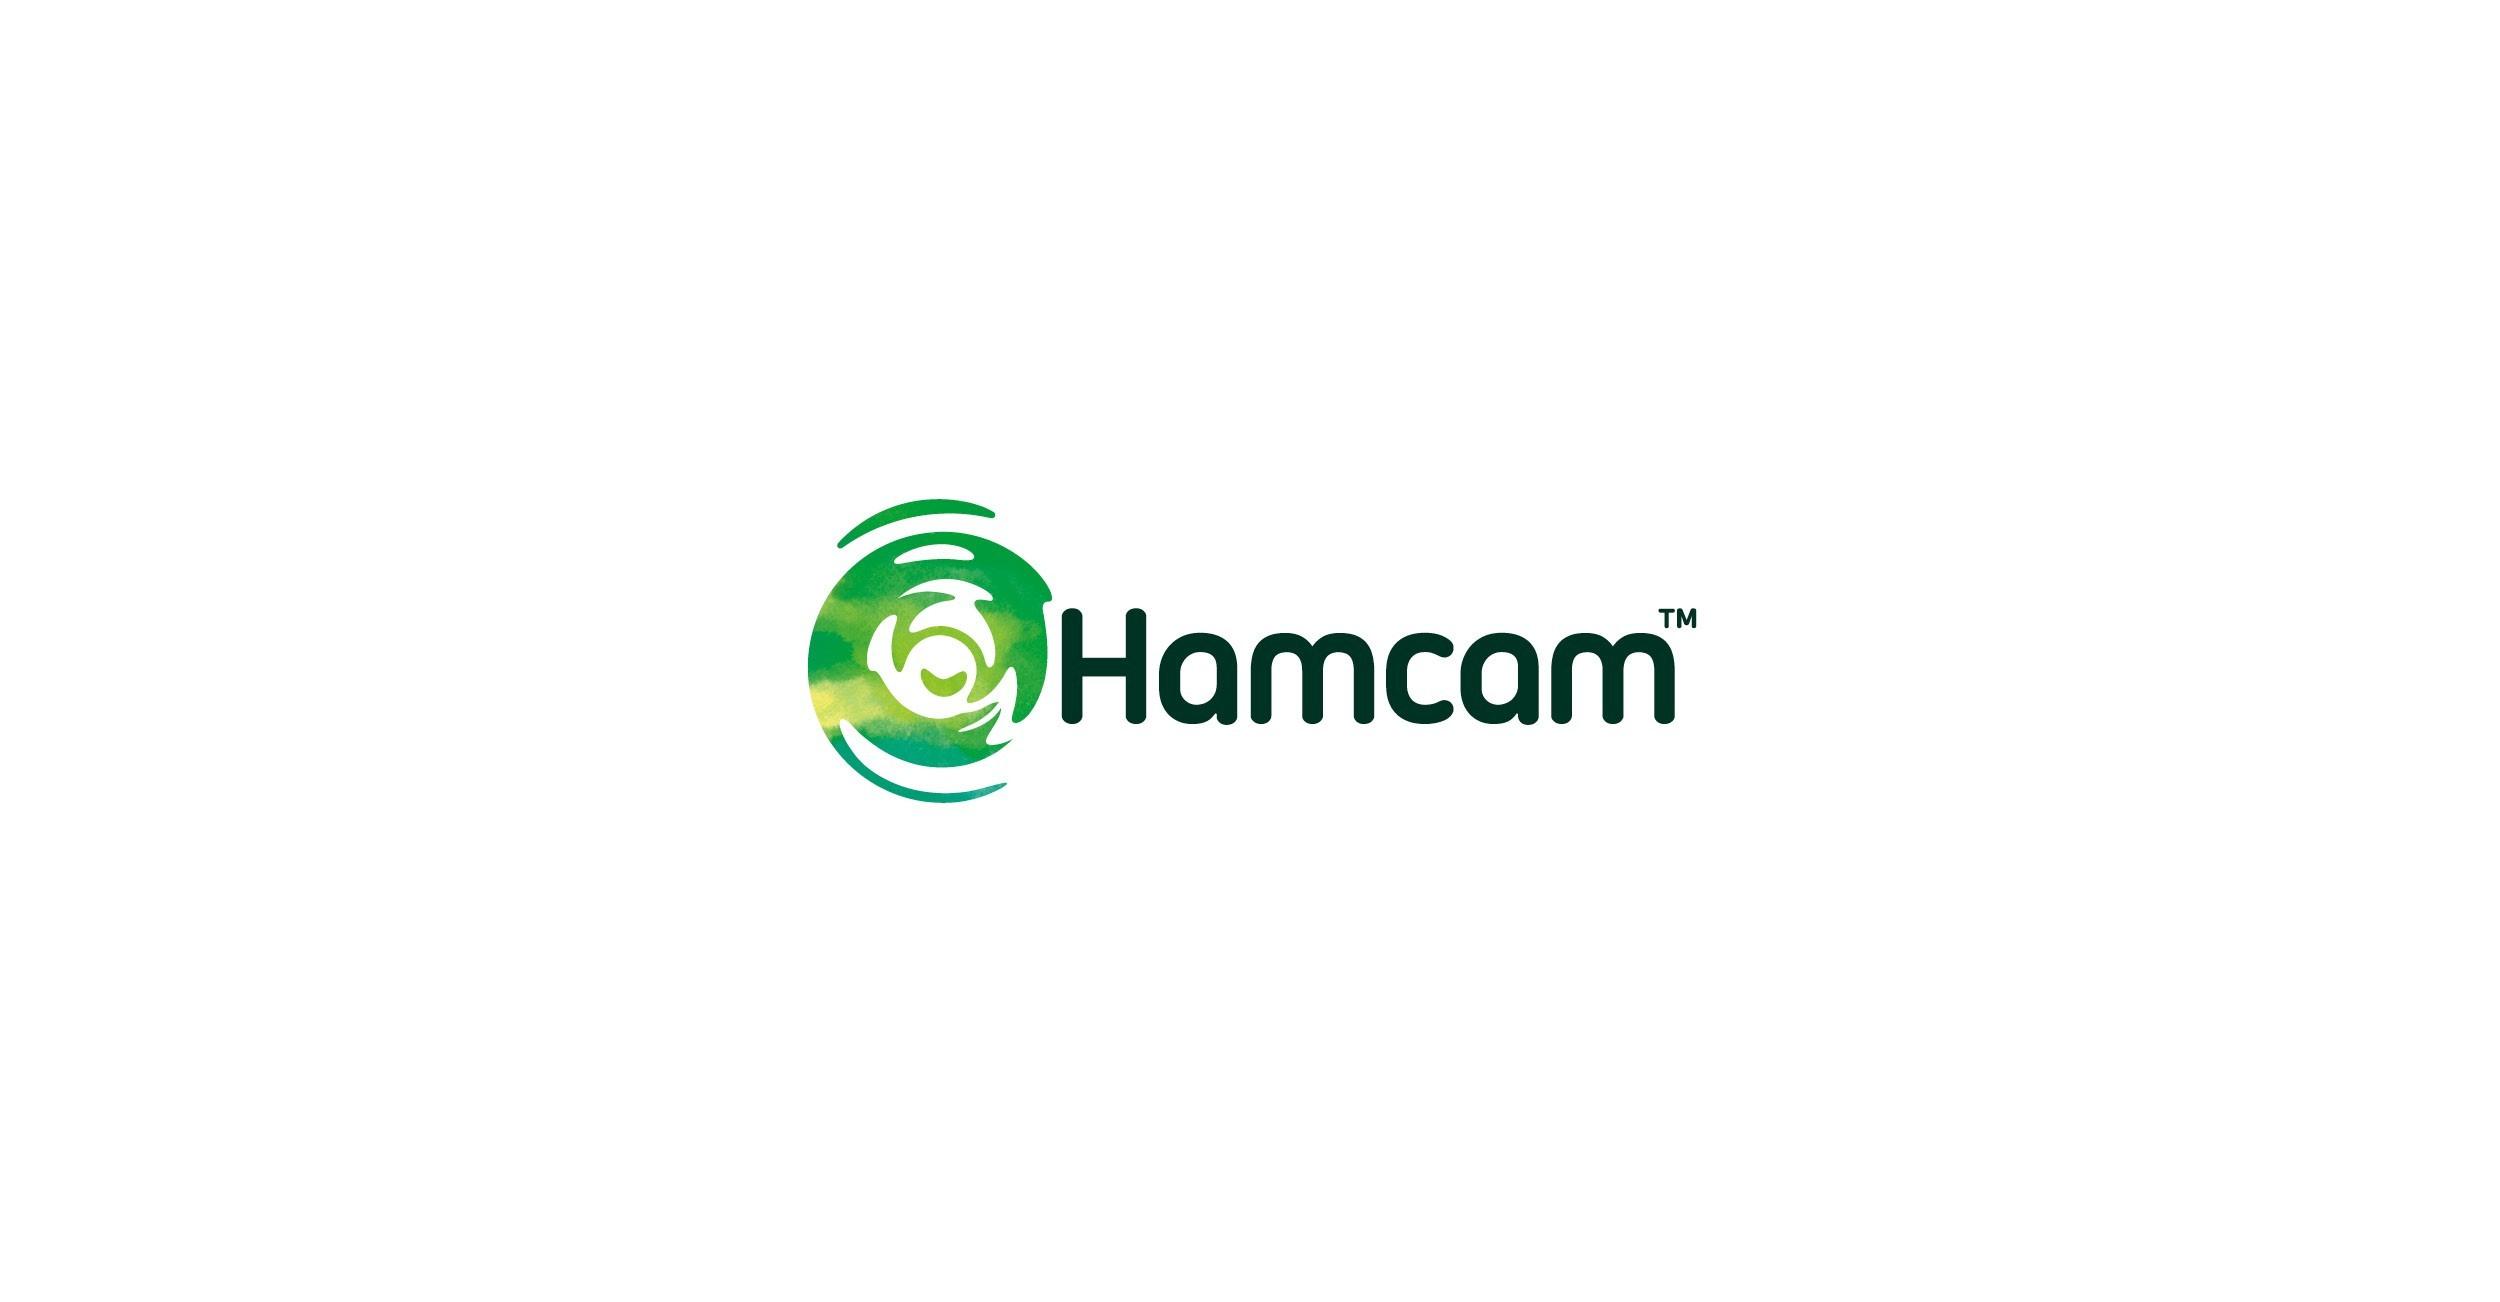 Hamcam Images